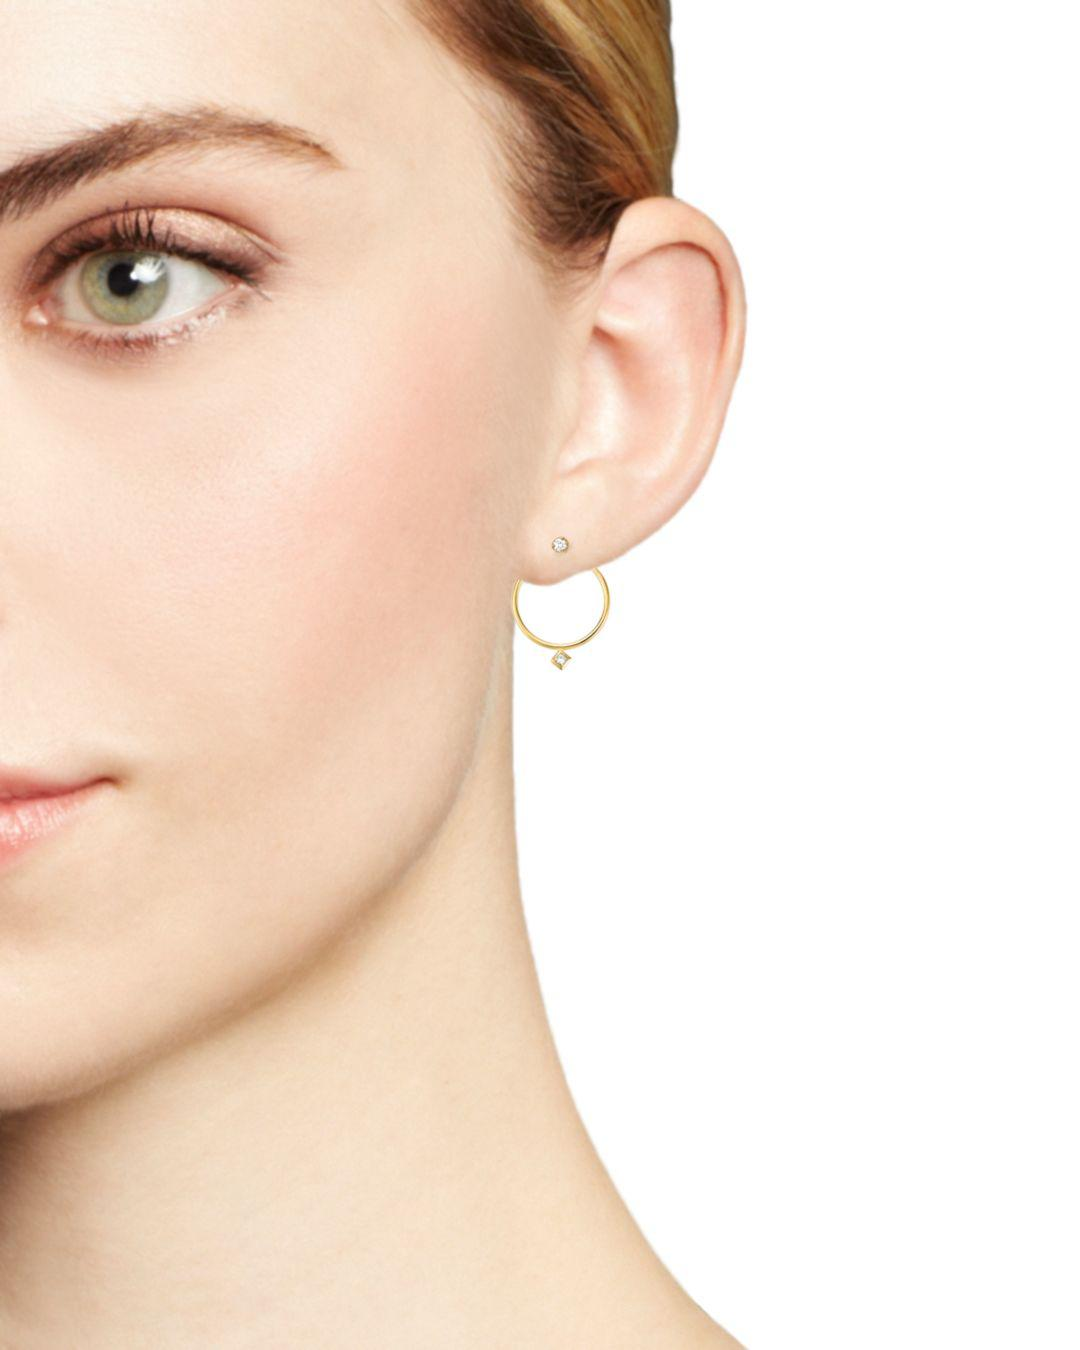 Zoe Chicco 14k Yellow Gold Diamond Circle Ear Jackets in White/Gold (Metallic)